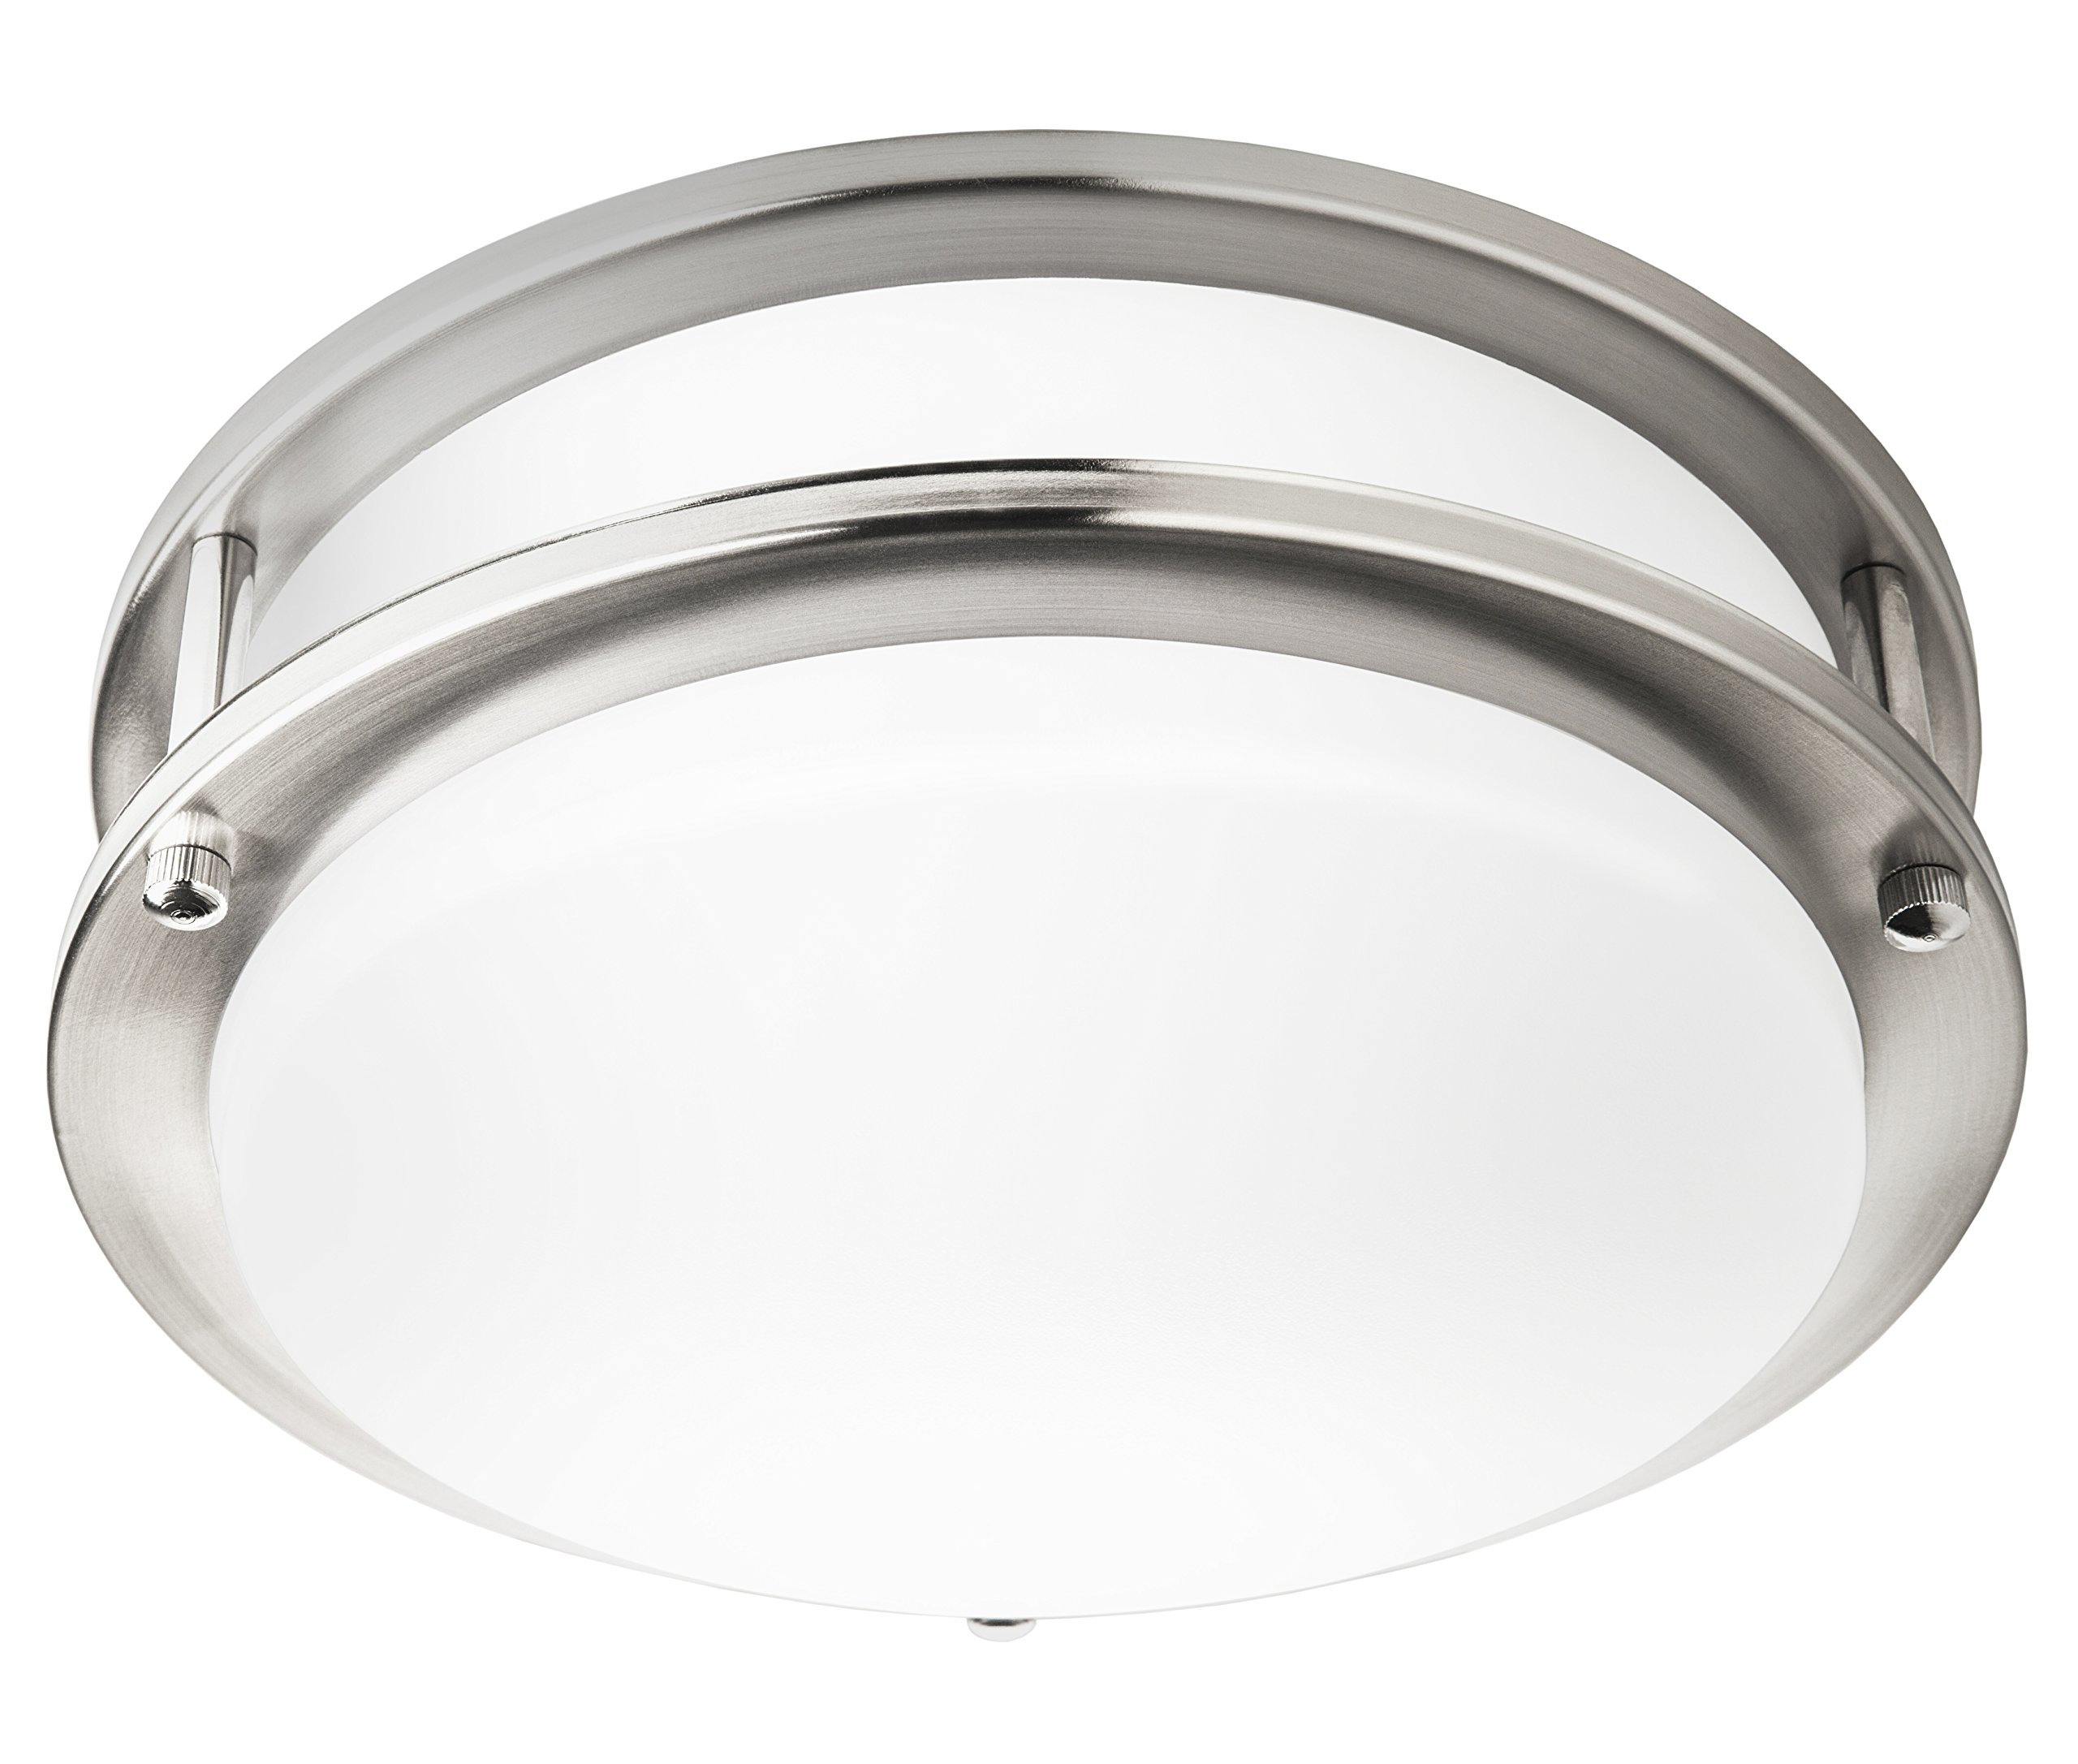 Hyperikon LED Flush Mount Ceiling Light, 10'', 65W equivalent, 1140lm, 3000K (Soft White Glow), 120V, 10-Inch, Dimmable